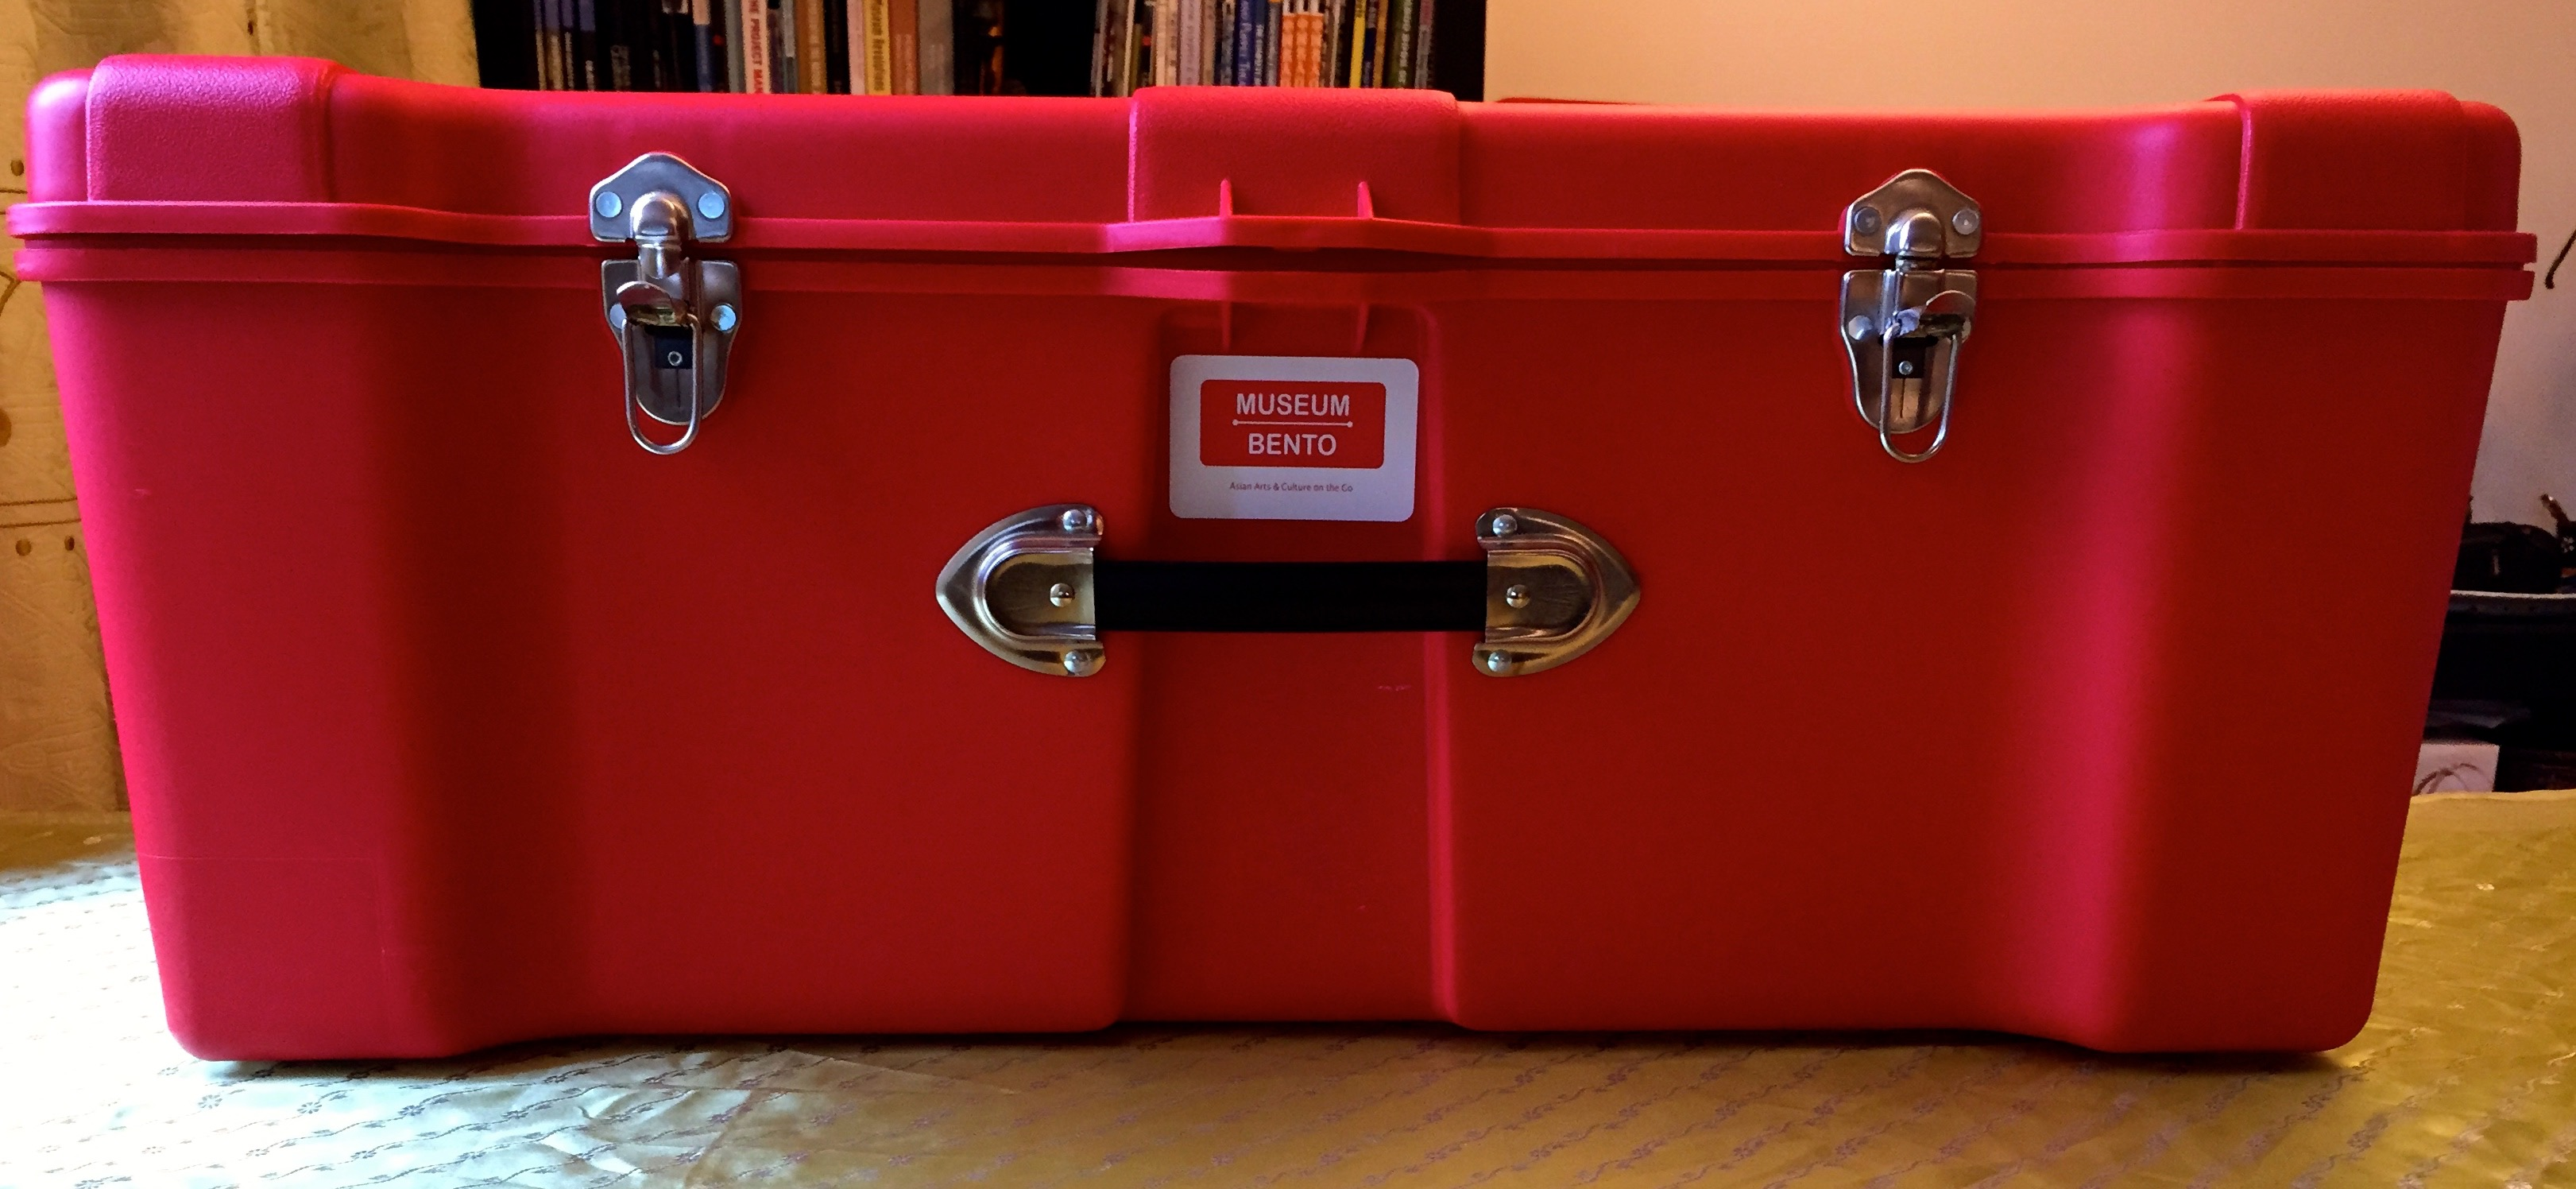 Museum Bento box